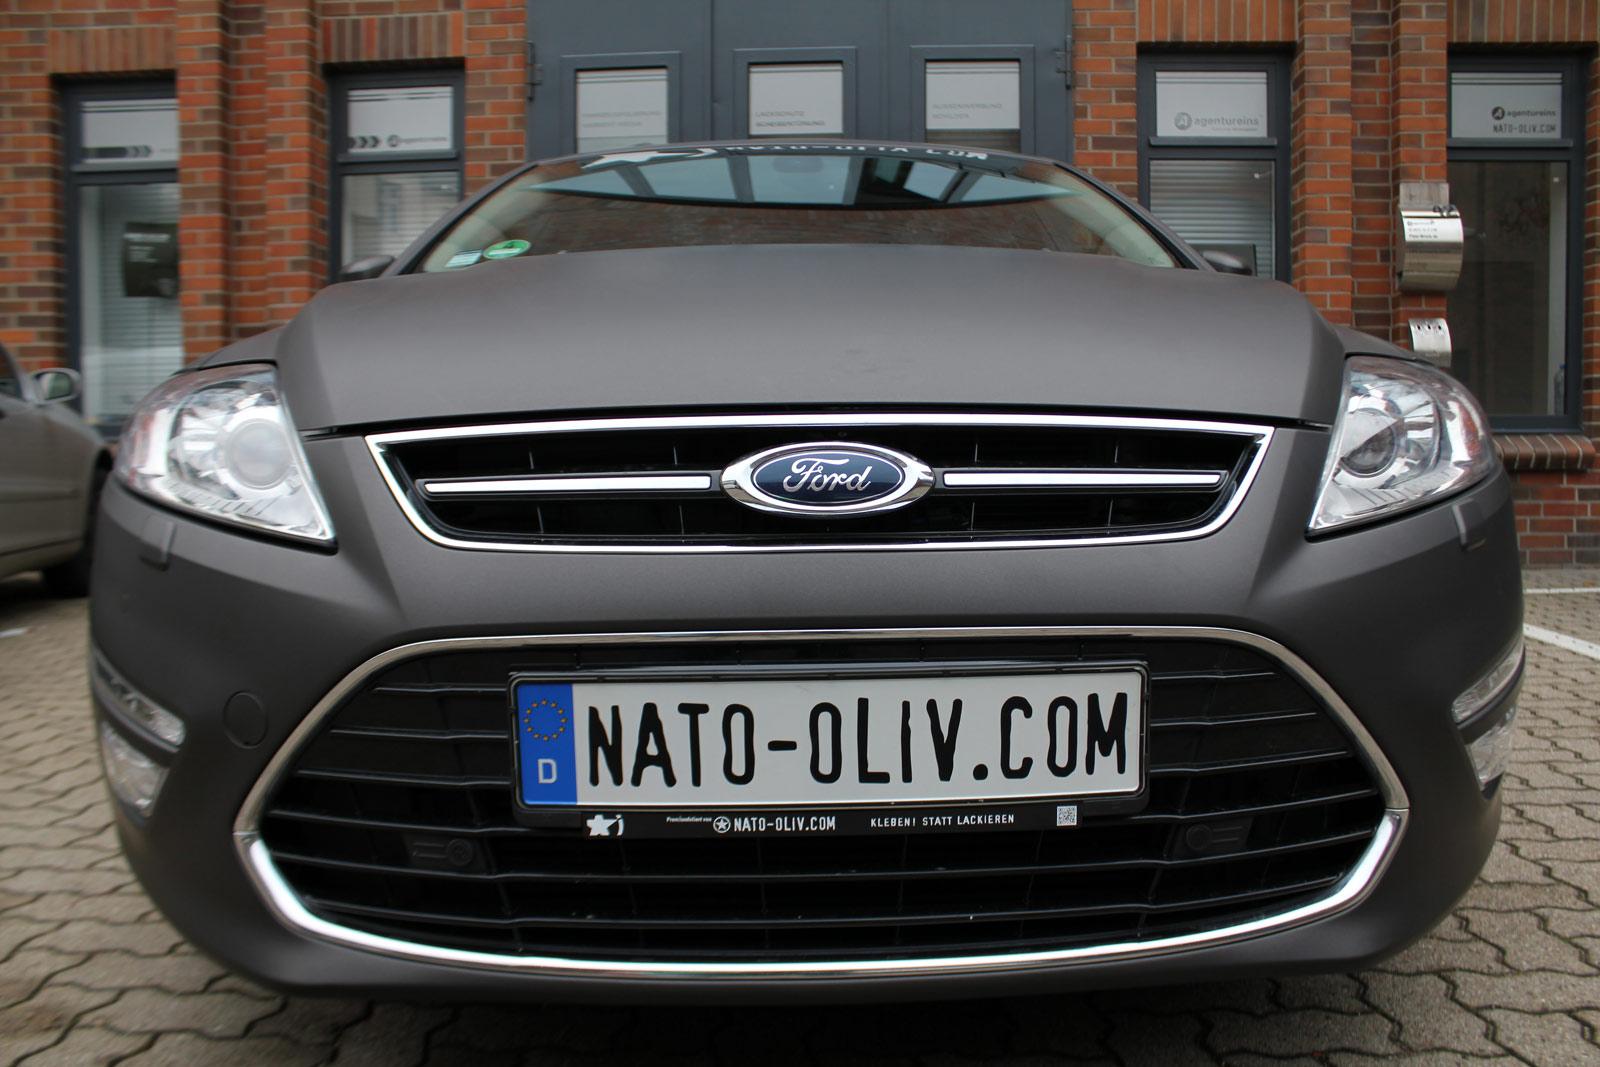 Ford_Mondeo_Folierung_Schwarz_Braun_Matt_Metallic_21